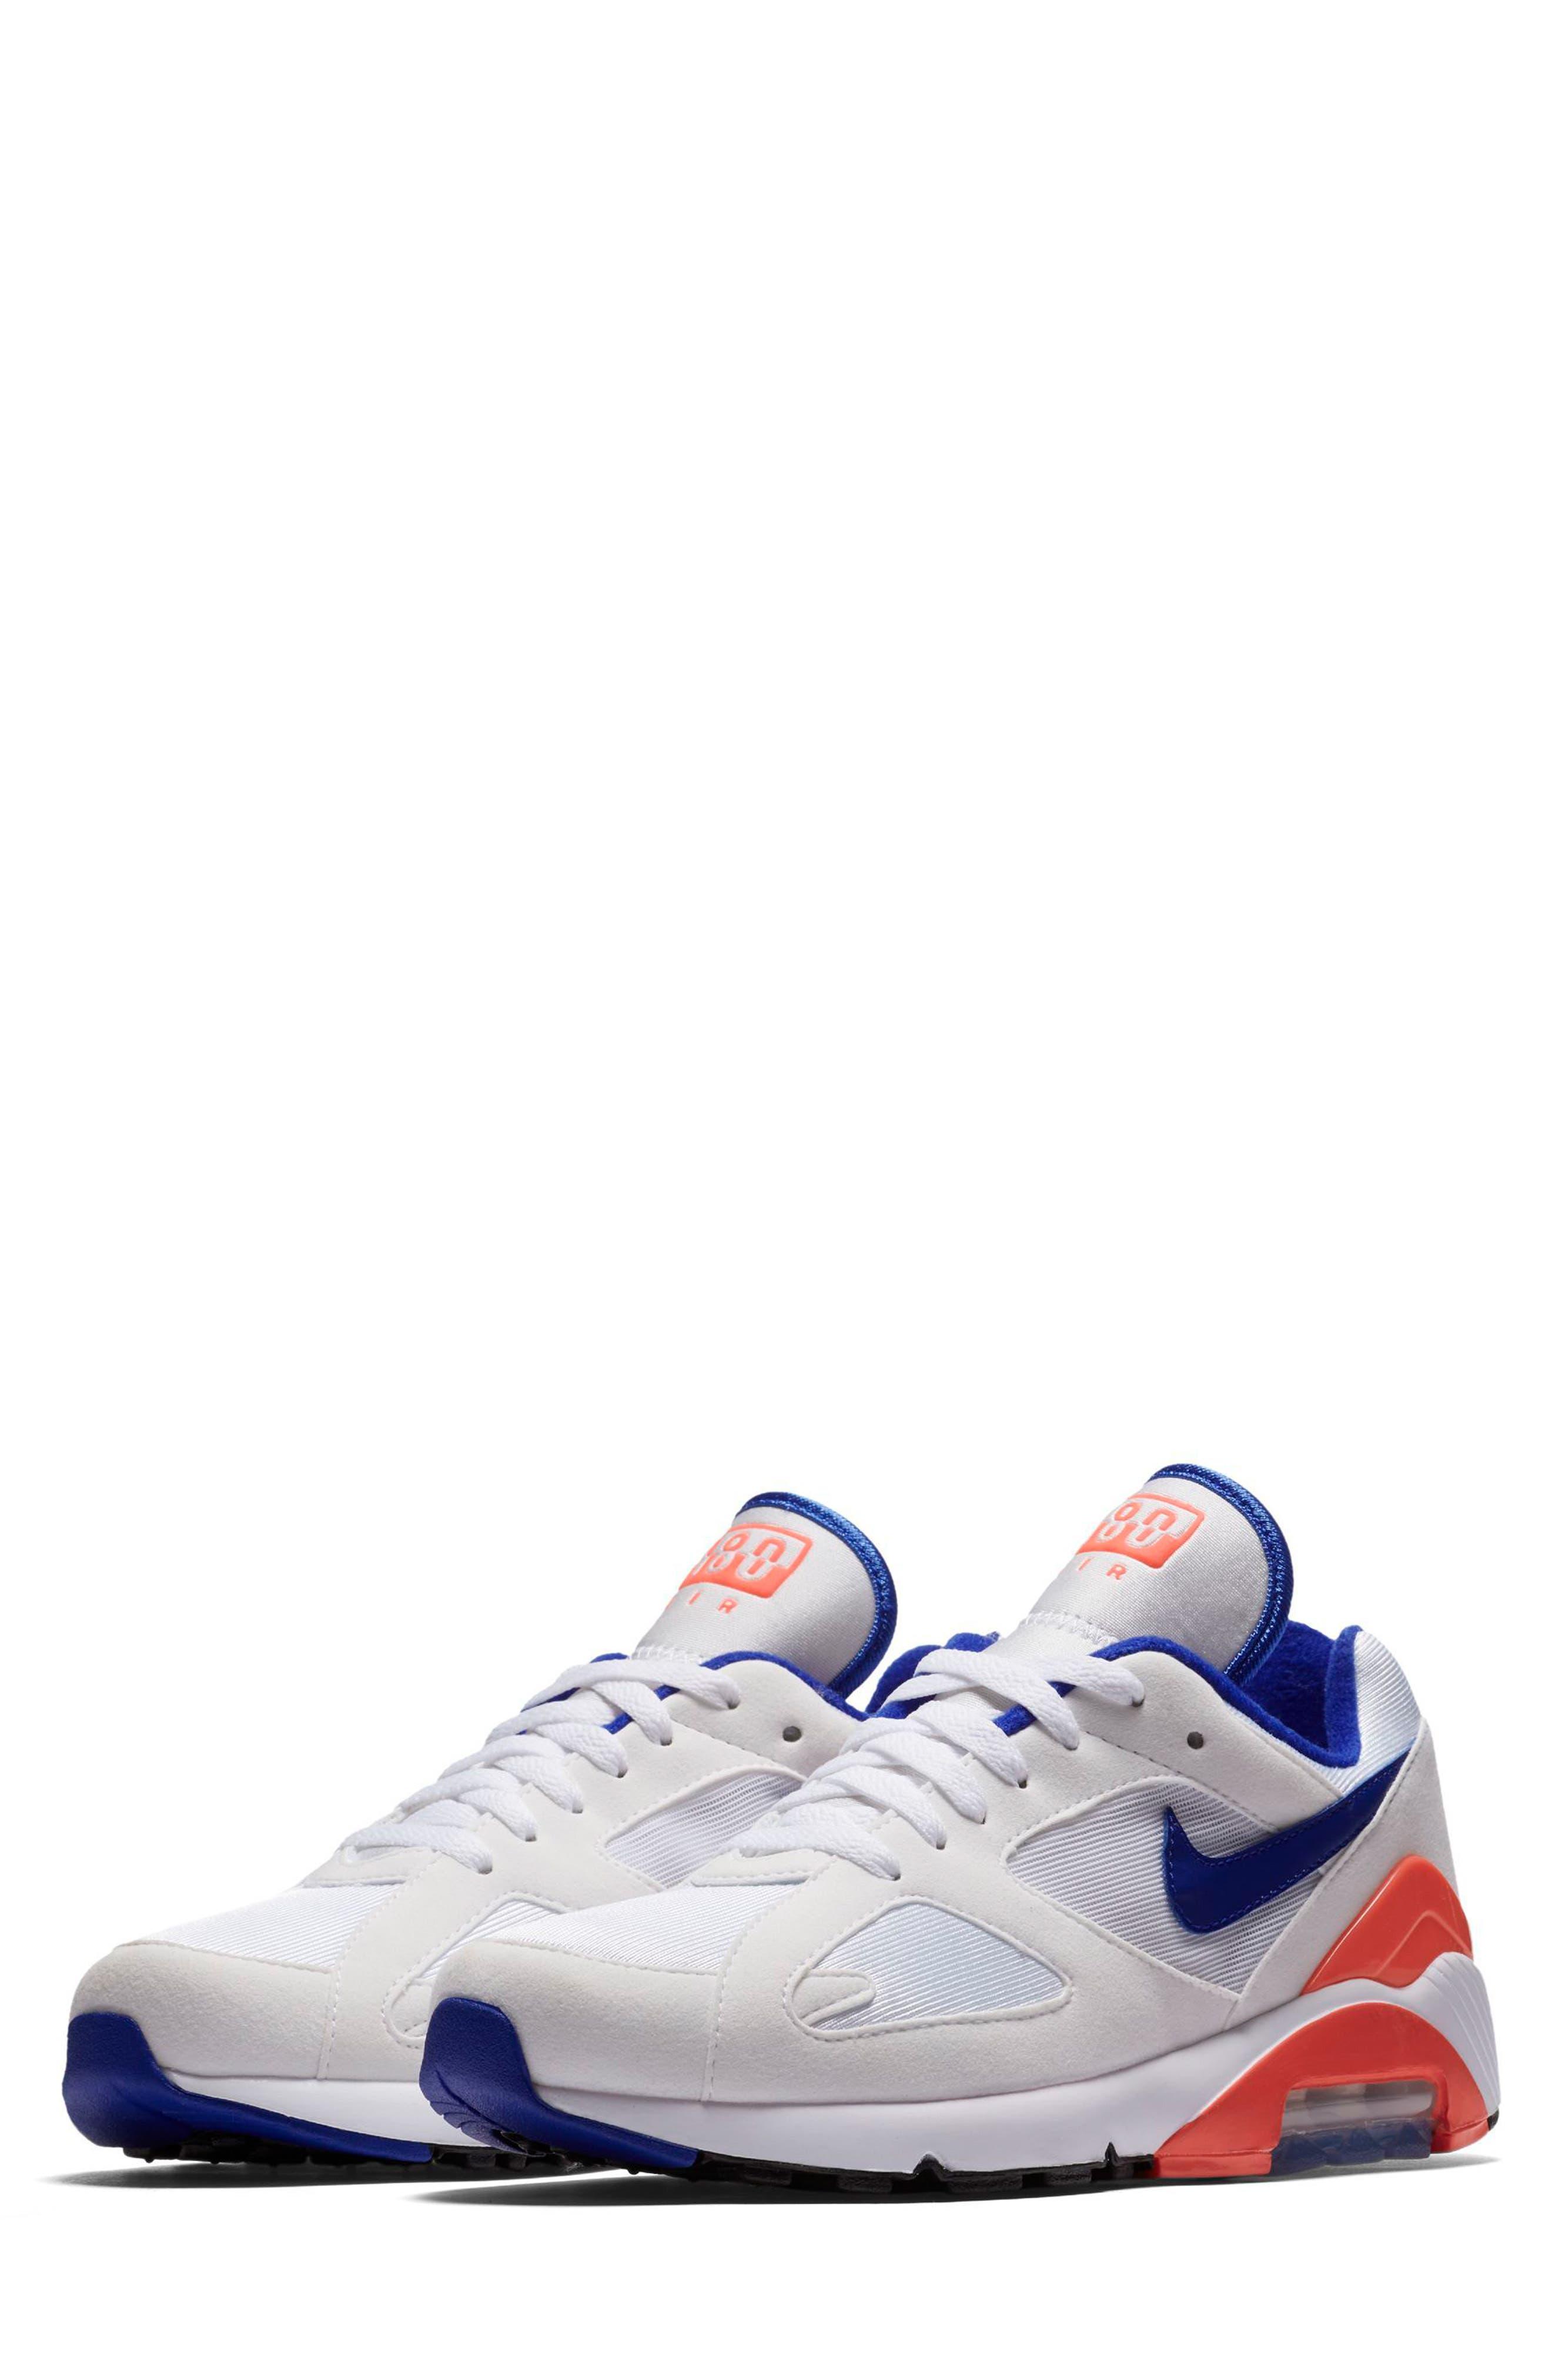 Air Max 180 Sneaker,                         Main,                         color, White/ Ultramarine